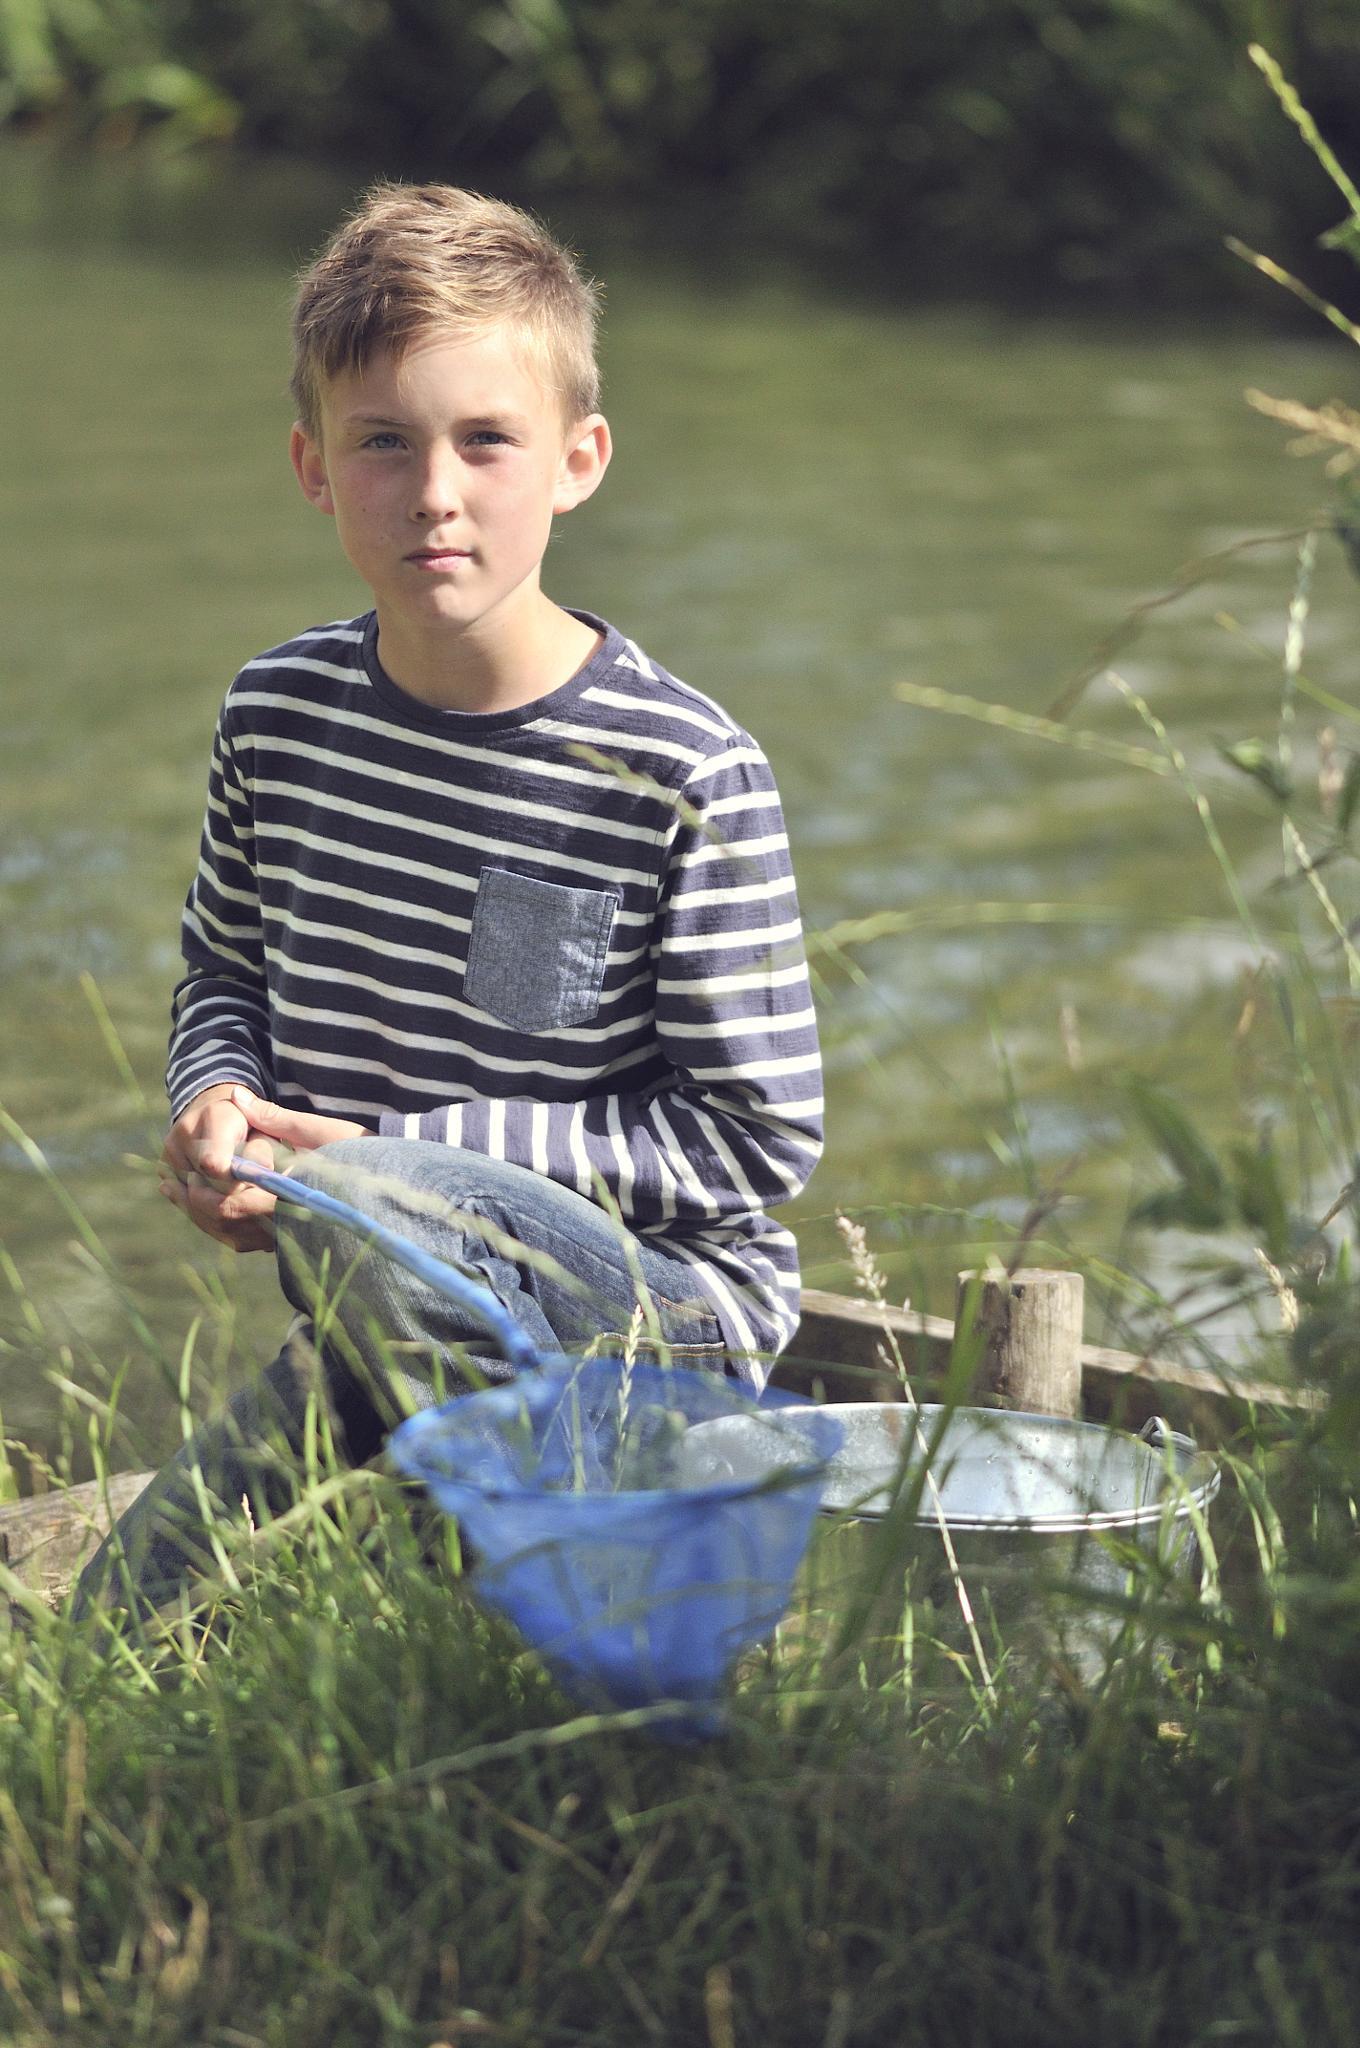 Gone fishing! by Cath Hardwick